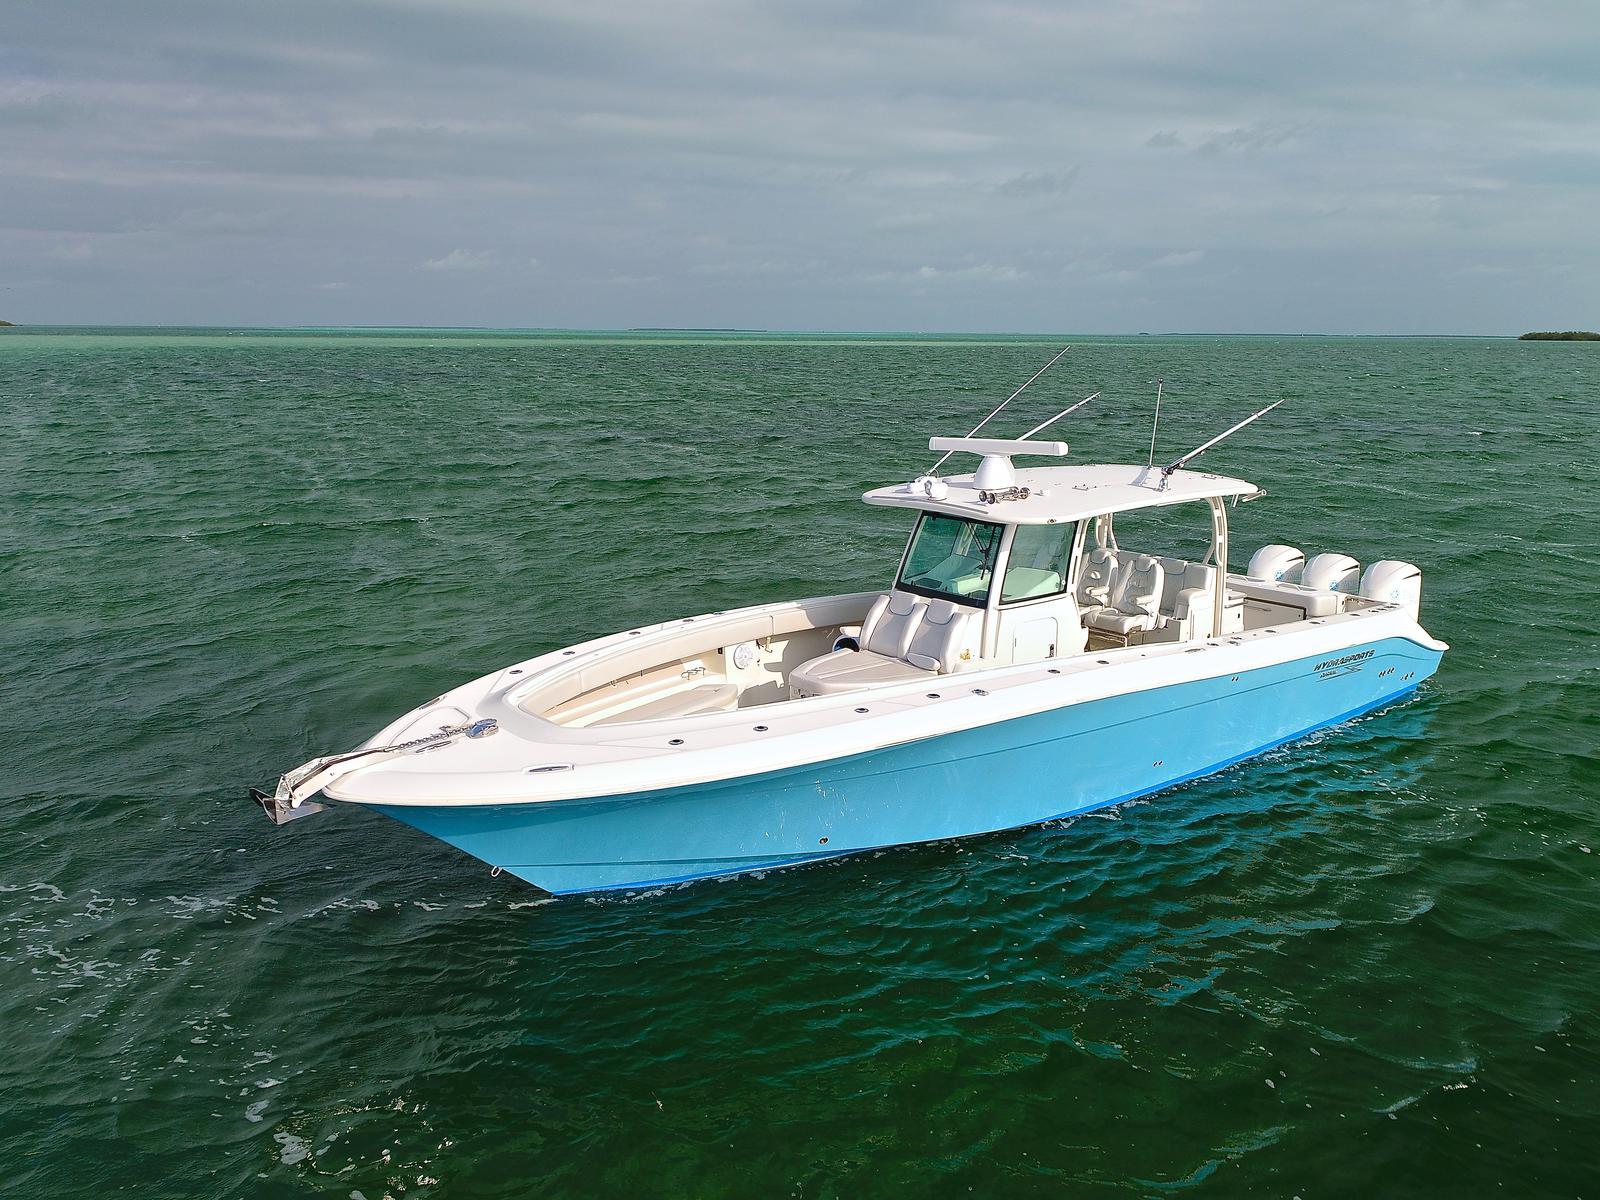 2014 Hydra Sports Custom 4200 Siesta for sale in Tavernier, FL ...